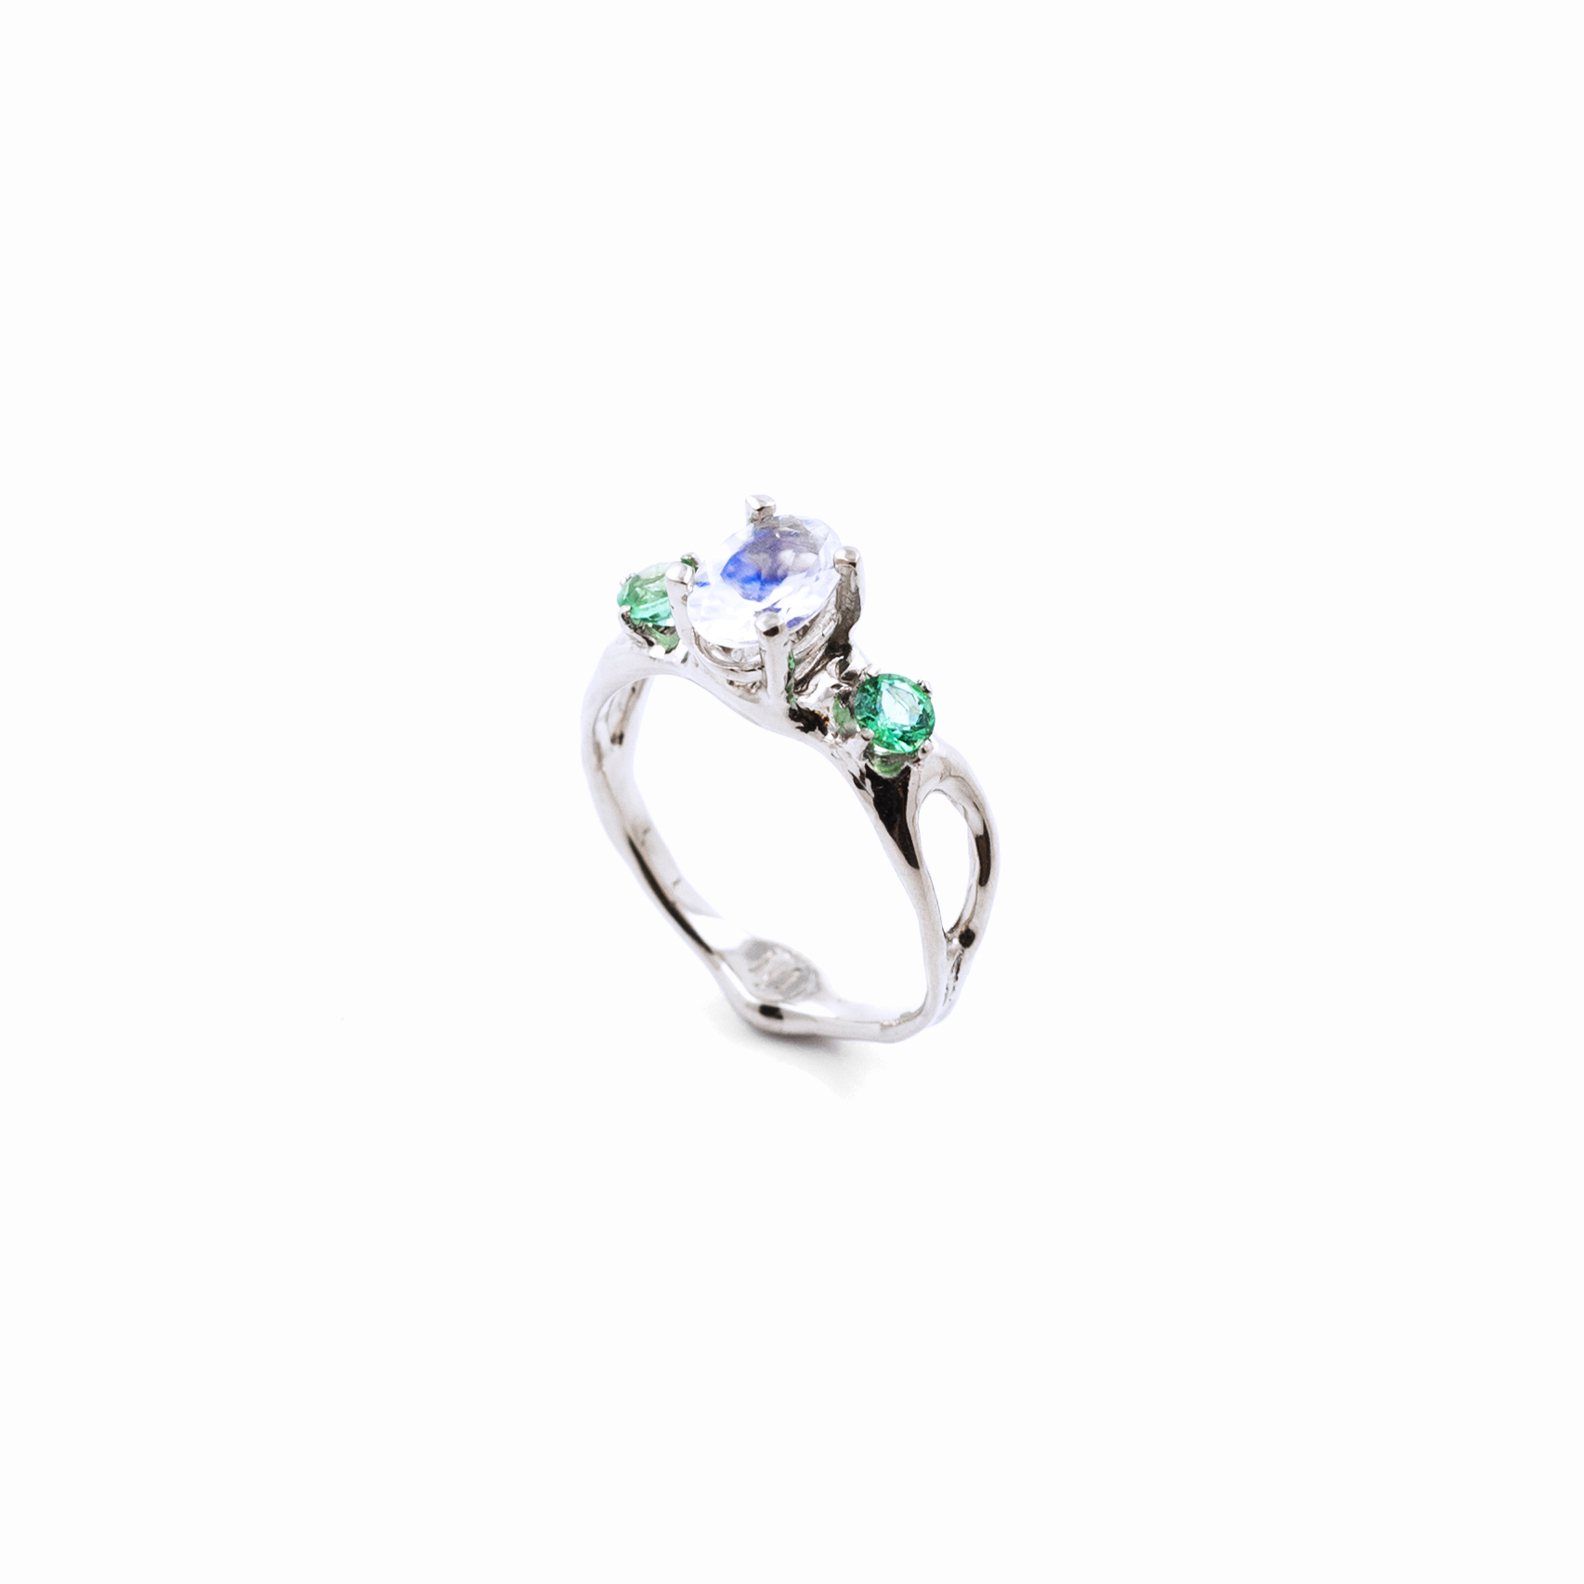 Unfolding Engagement Ring   White gold, moonstone, emeralds.